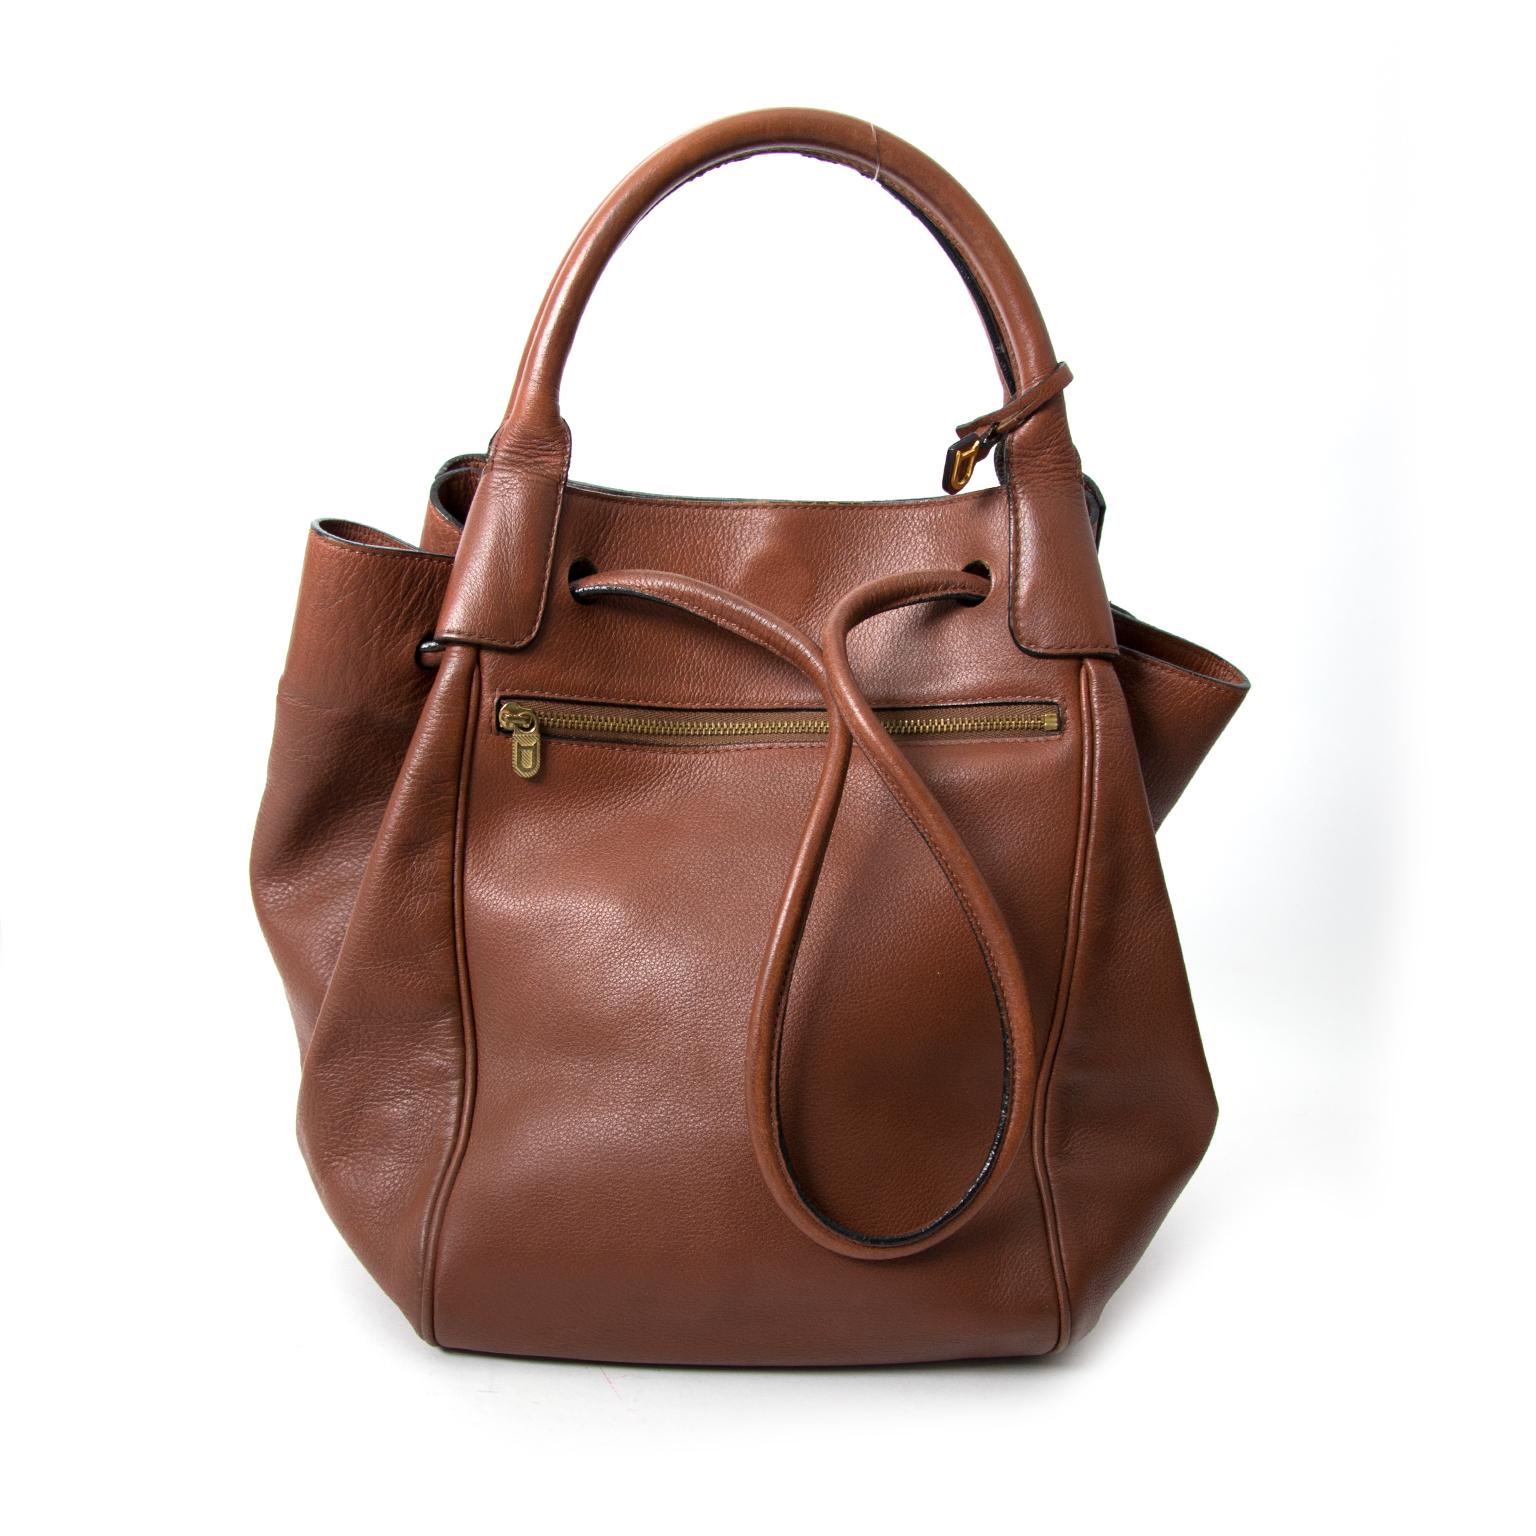 shop safe online at the best price secondhand koop veilig online tweedehands Delvaux Brown Brillant MM + Strap